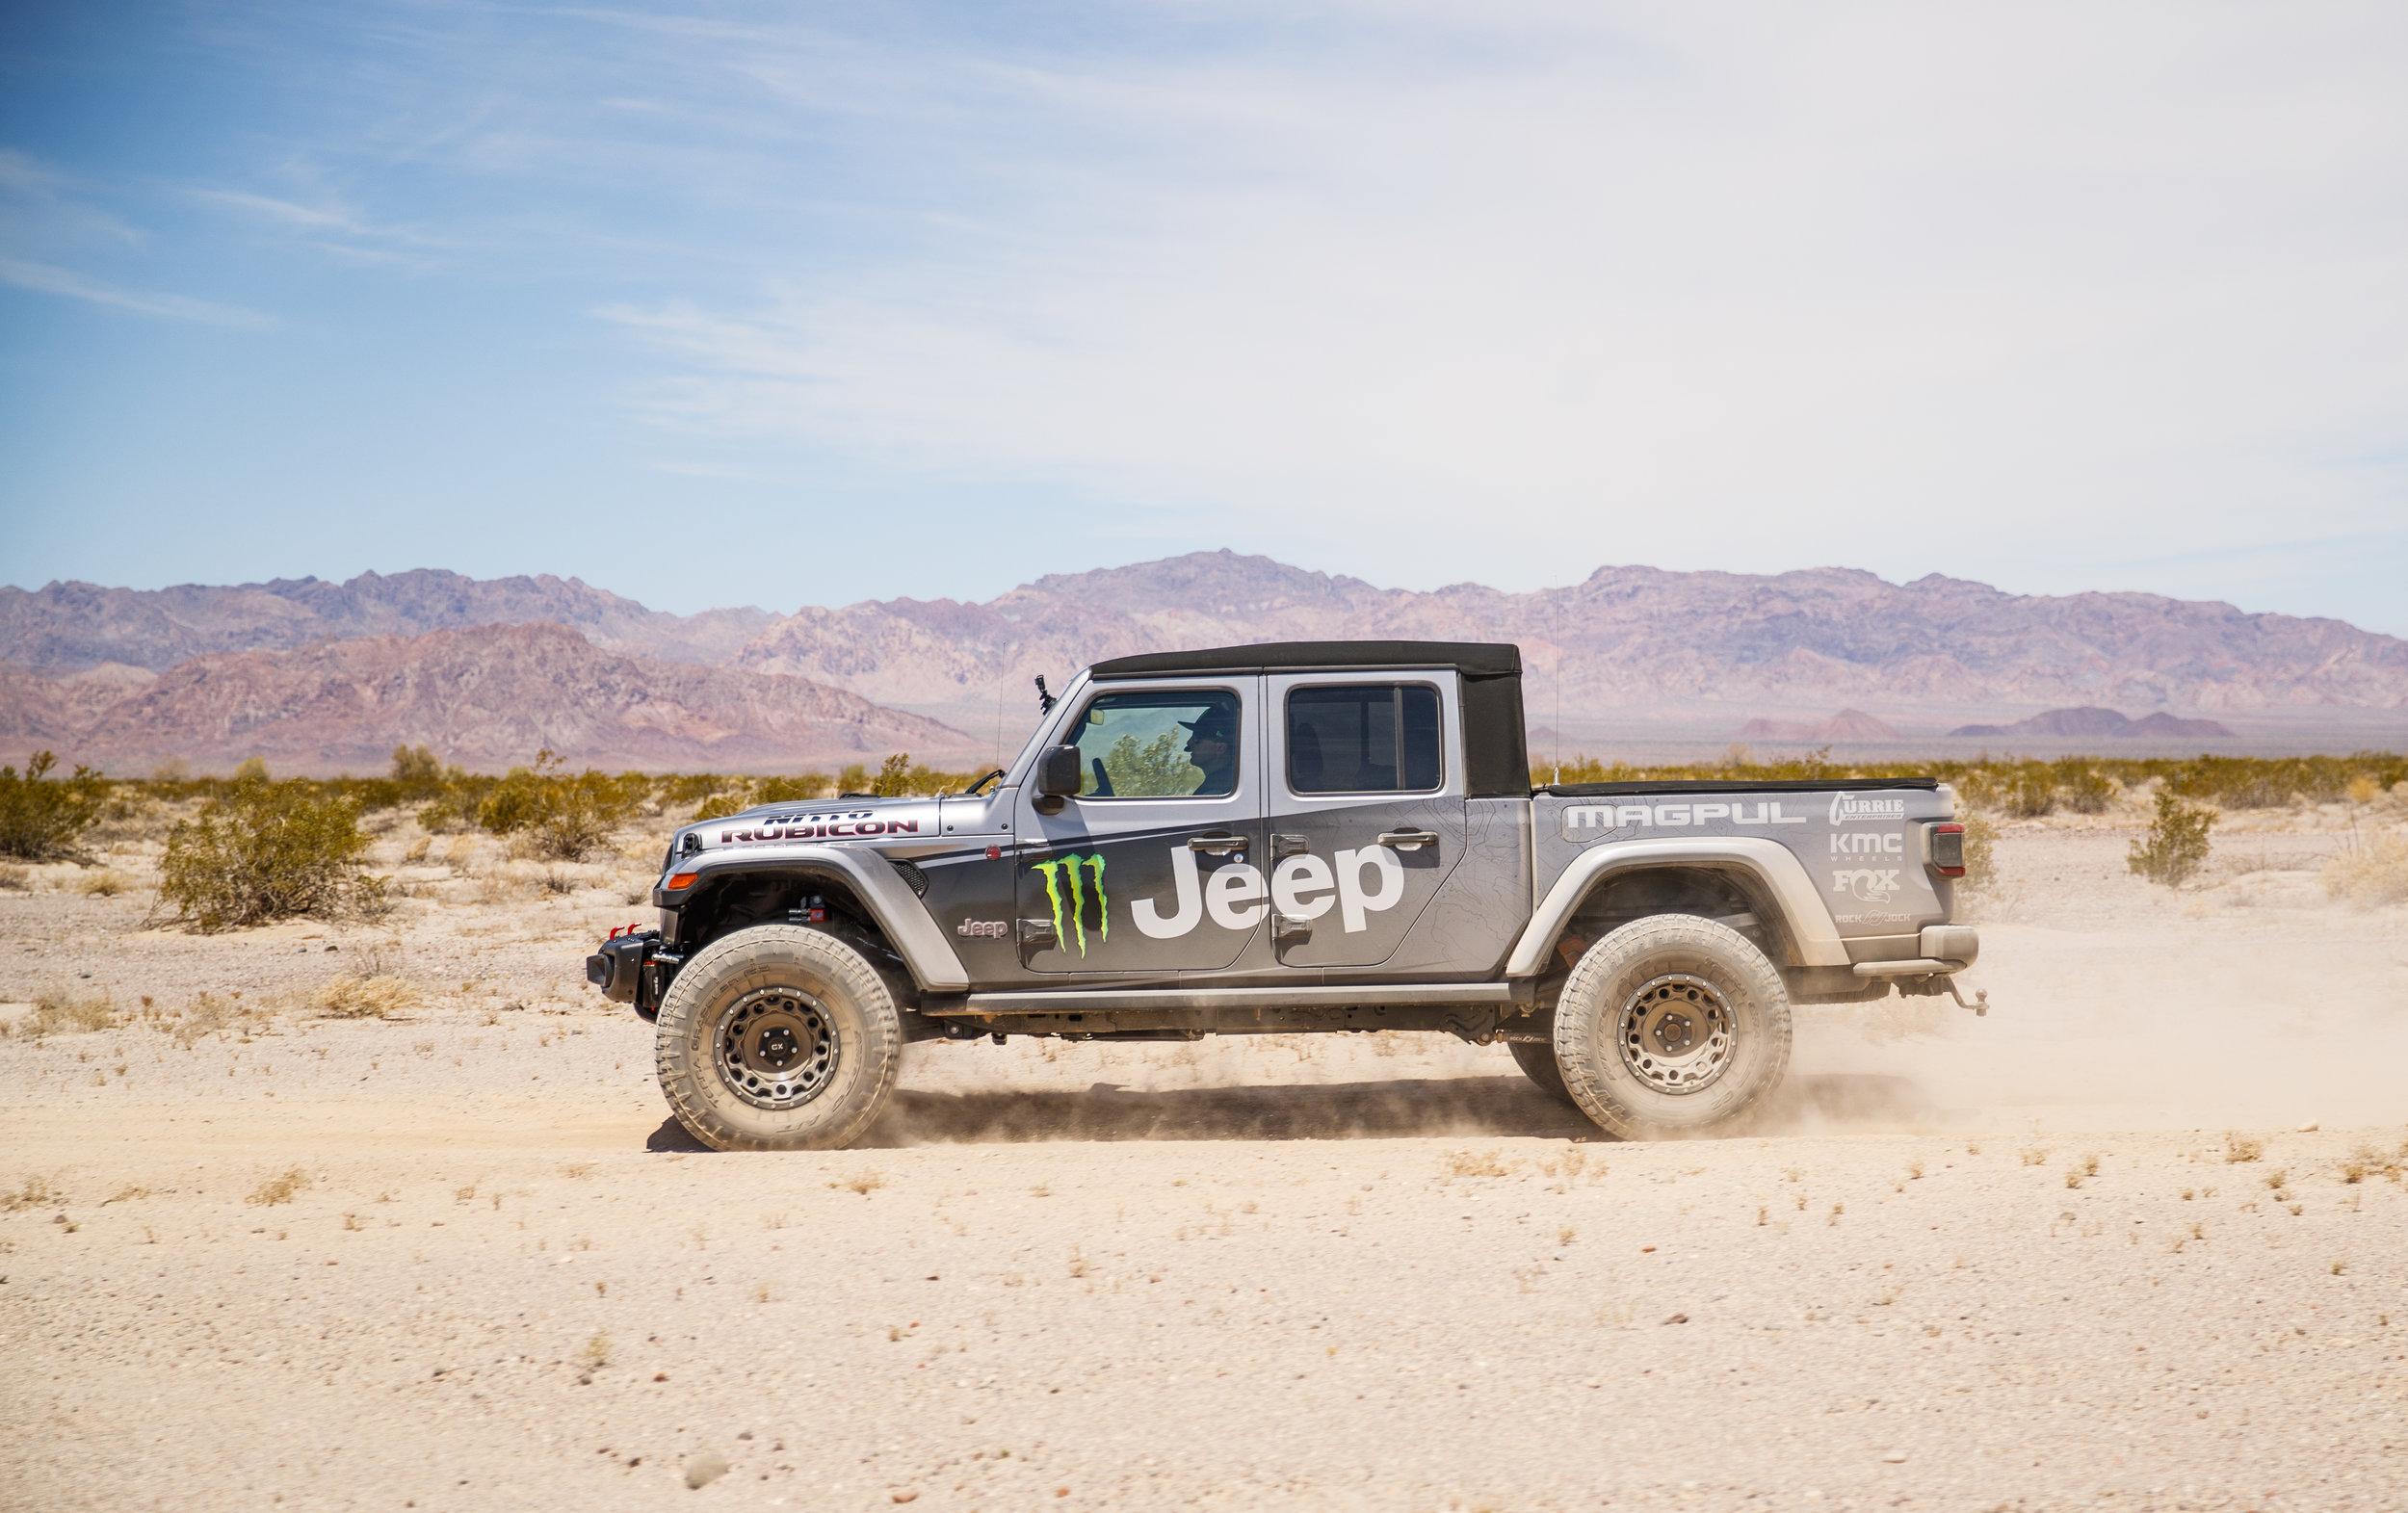 6_24_CaseyCurrie_Baja500PreRunning_BajaMexico_Jeep_002.jpg